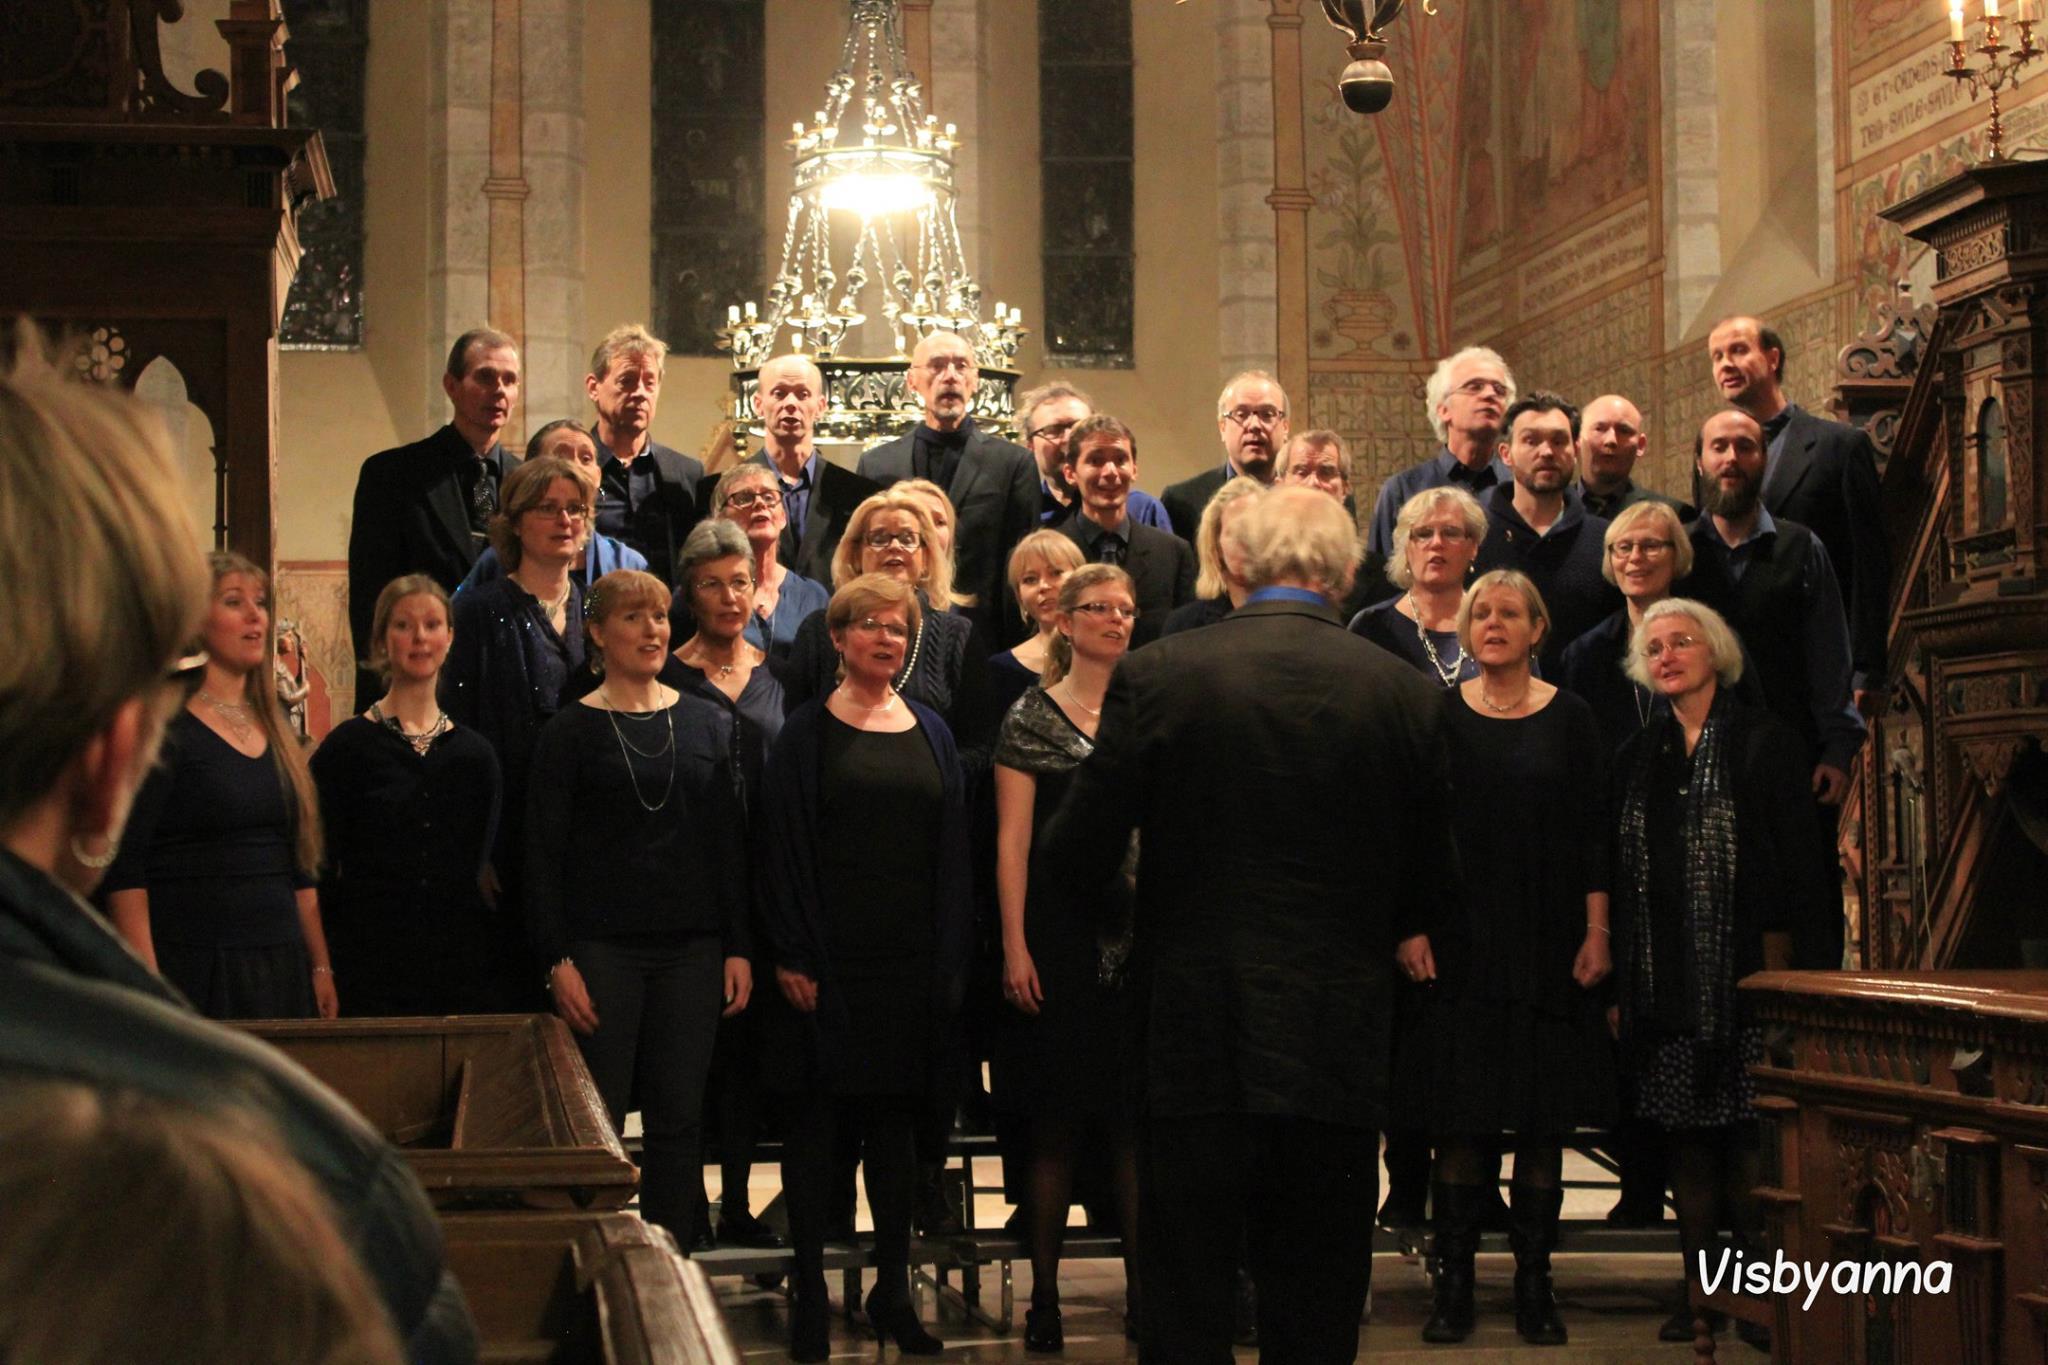 Adventskonsert i Dalhem kyrka 4/12. Foto: Anna Lindskog